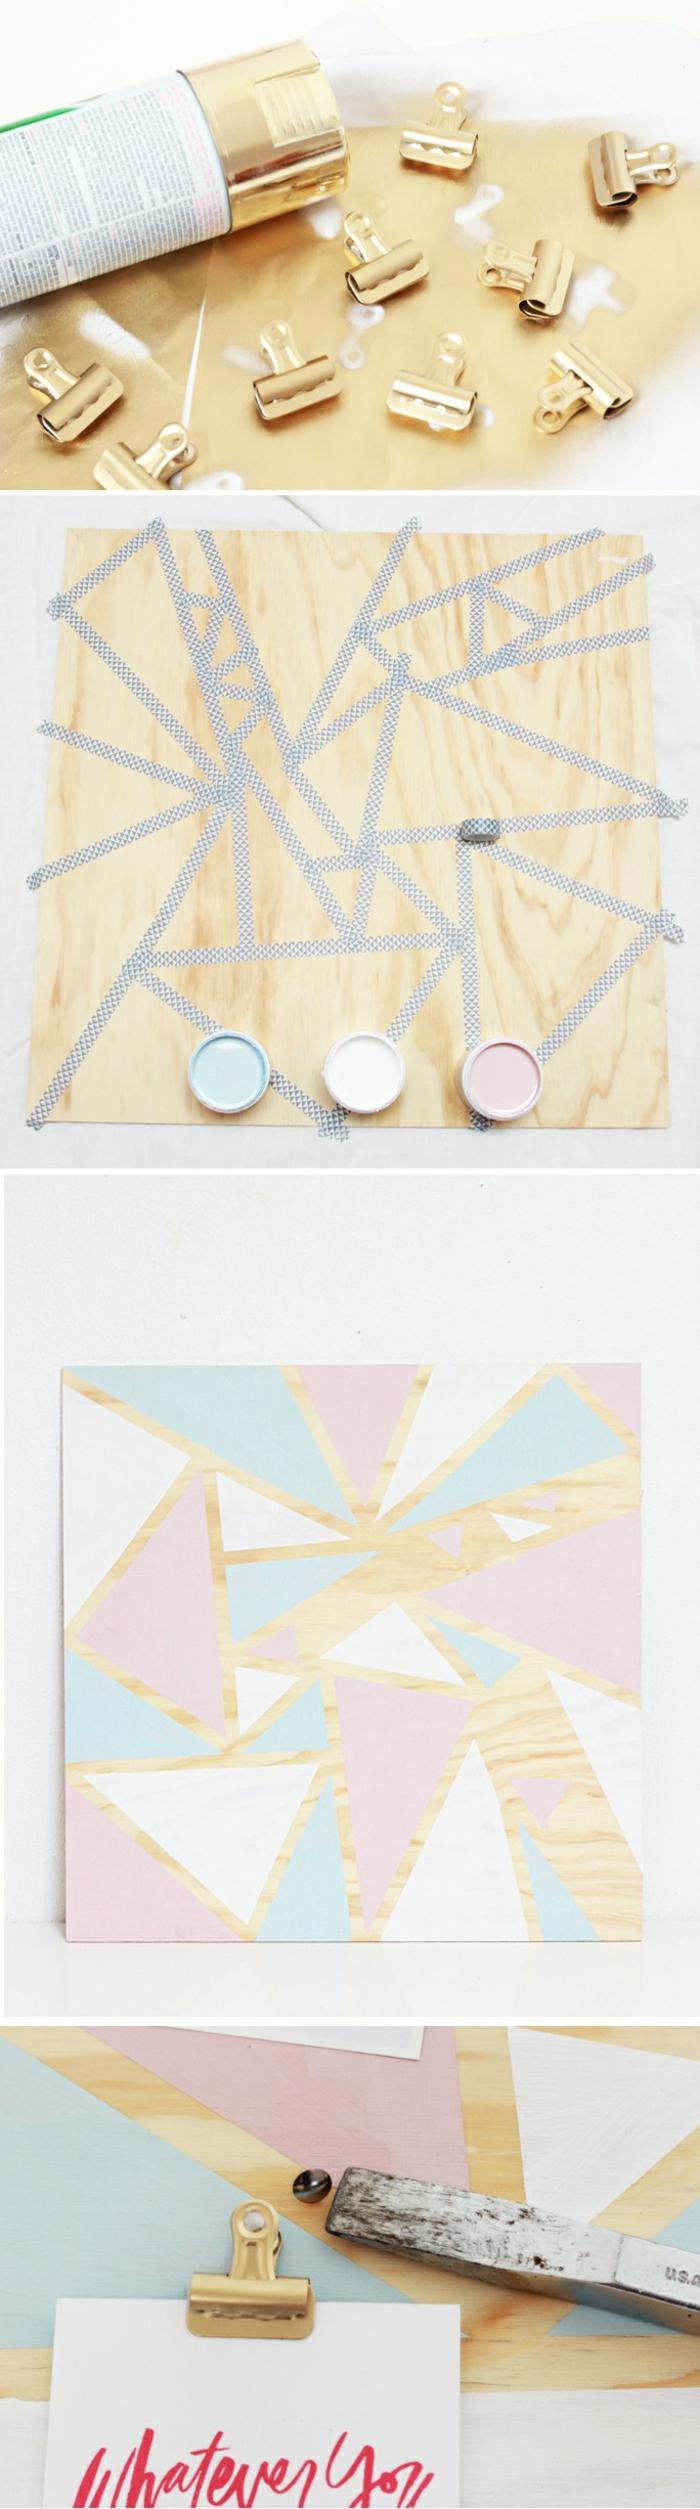 pinnwand selber machen, holzplatte, washi tape, acrylfarbe, goldenes spray